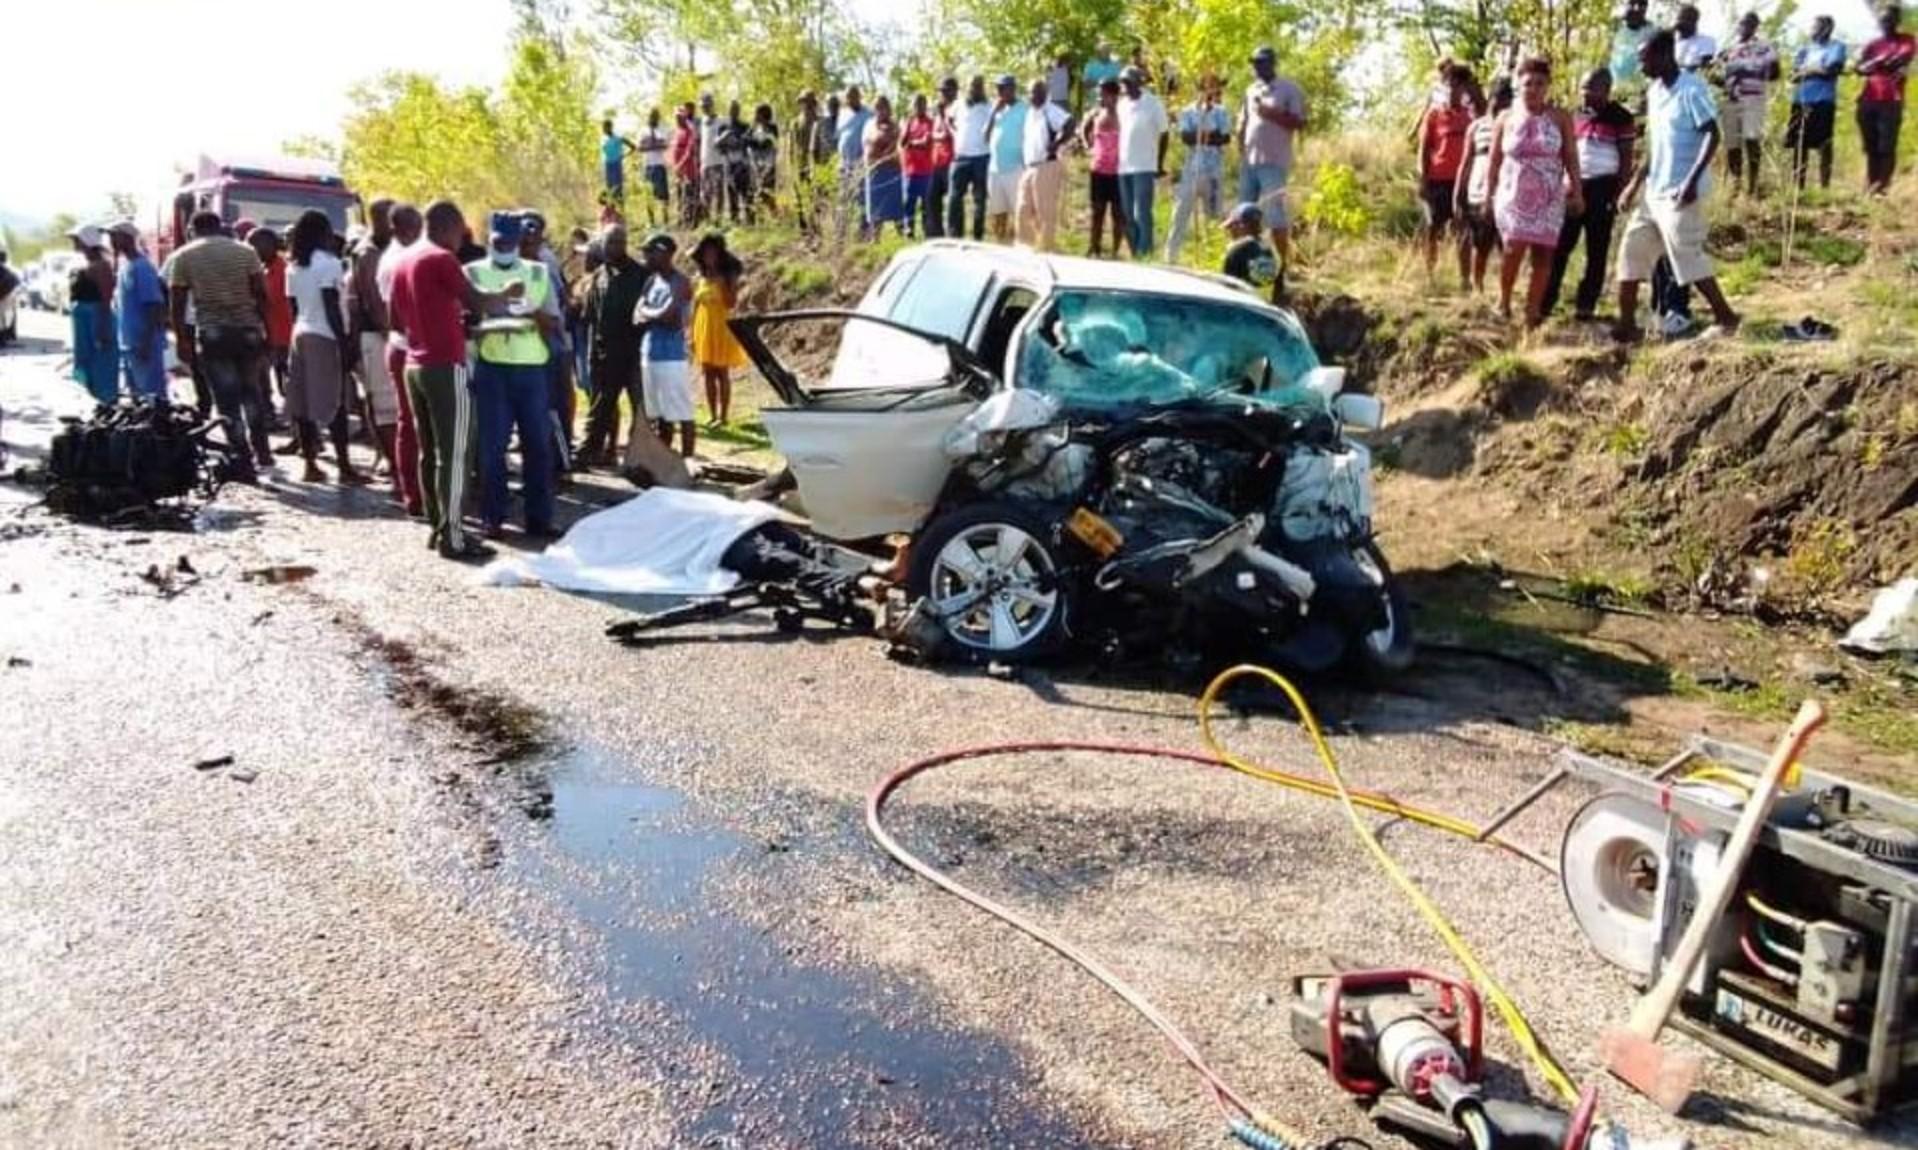 November Curse That Killed Ginimbi Strikes Again - Three People Burnt In Horrific Accident!